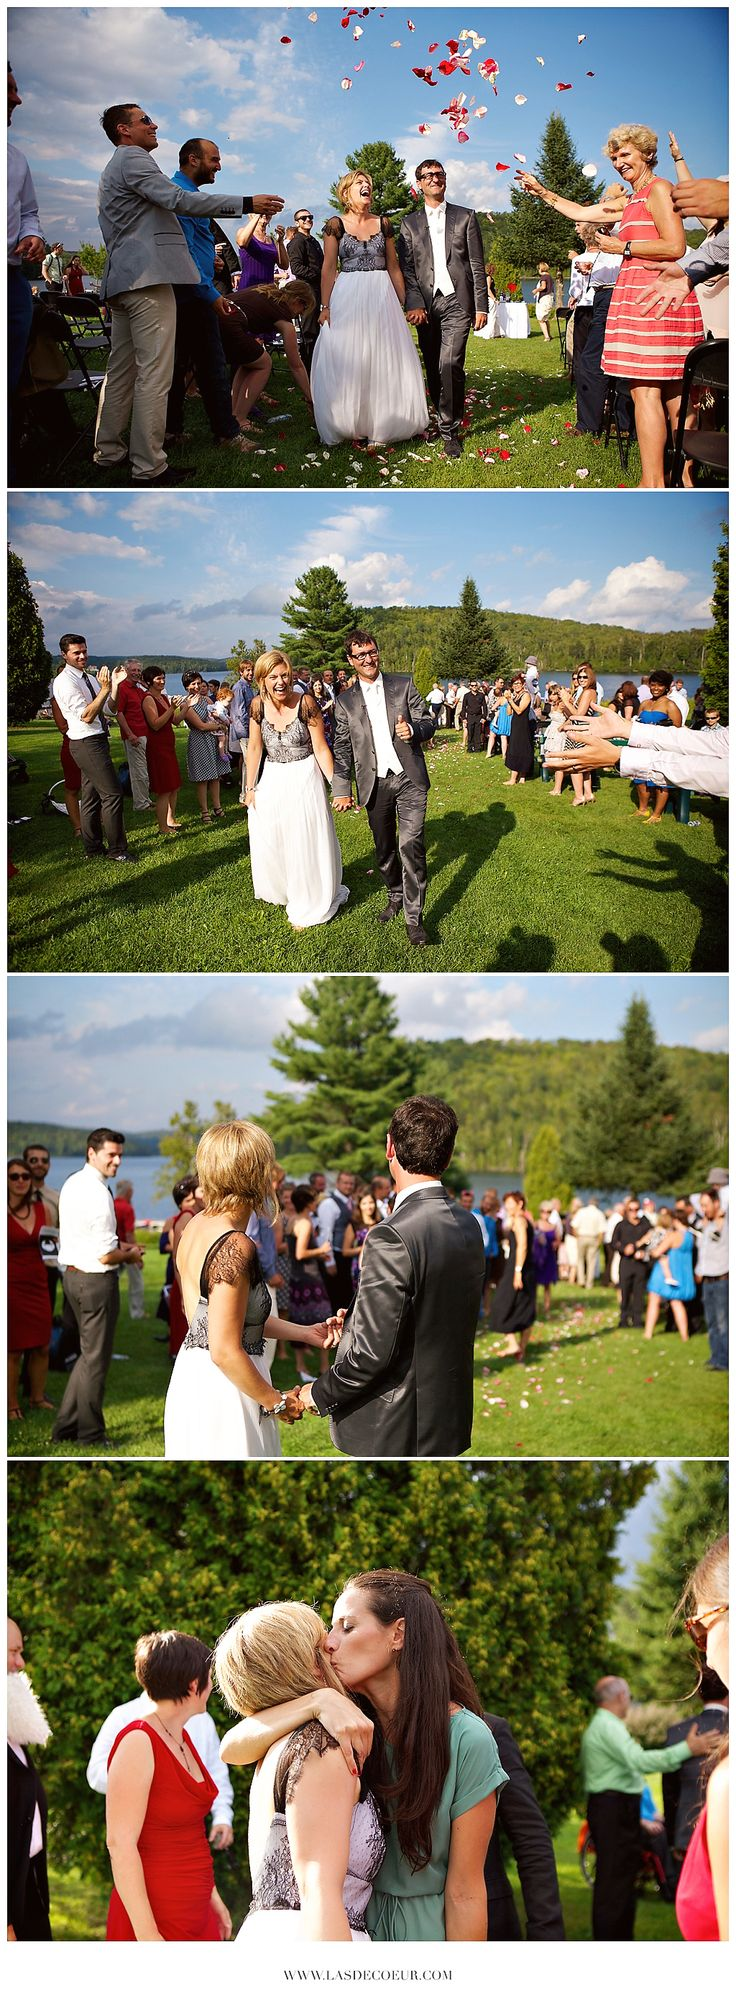 Mariage au Canada ©www.lasdecoeur.com - Photo + Cinéma Photo mariage  #love #wedding #weddingphotographer #photodecouple #photgraphemariage #lasdecoeurphoto #lovephotography  #weddingphotography